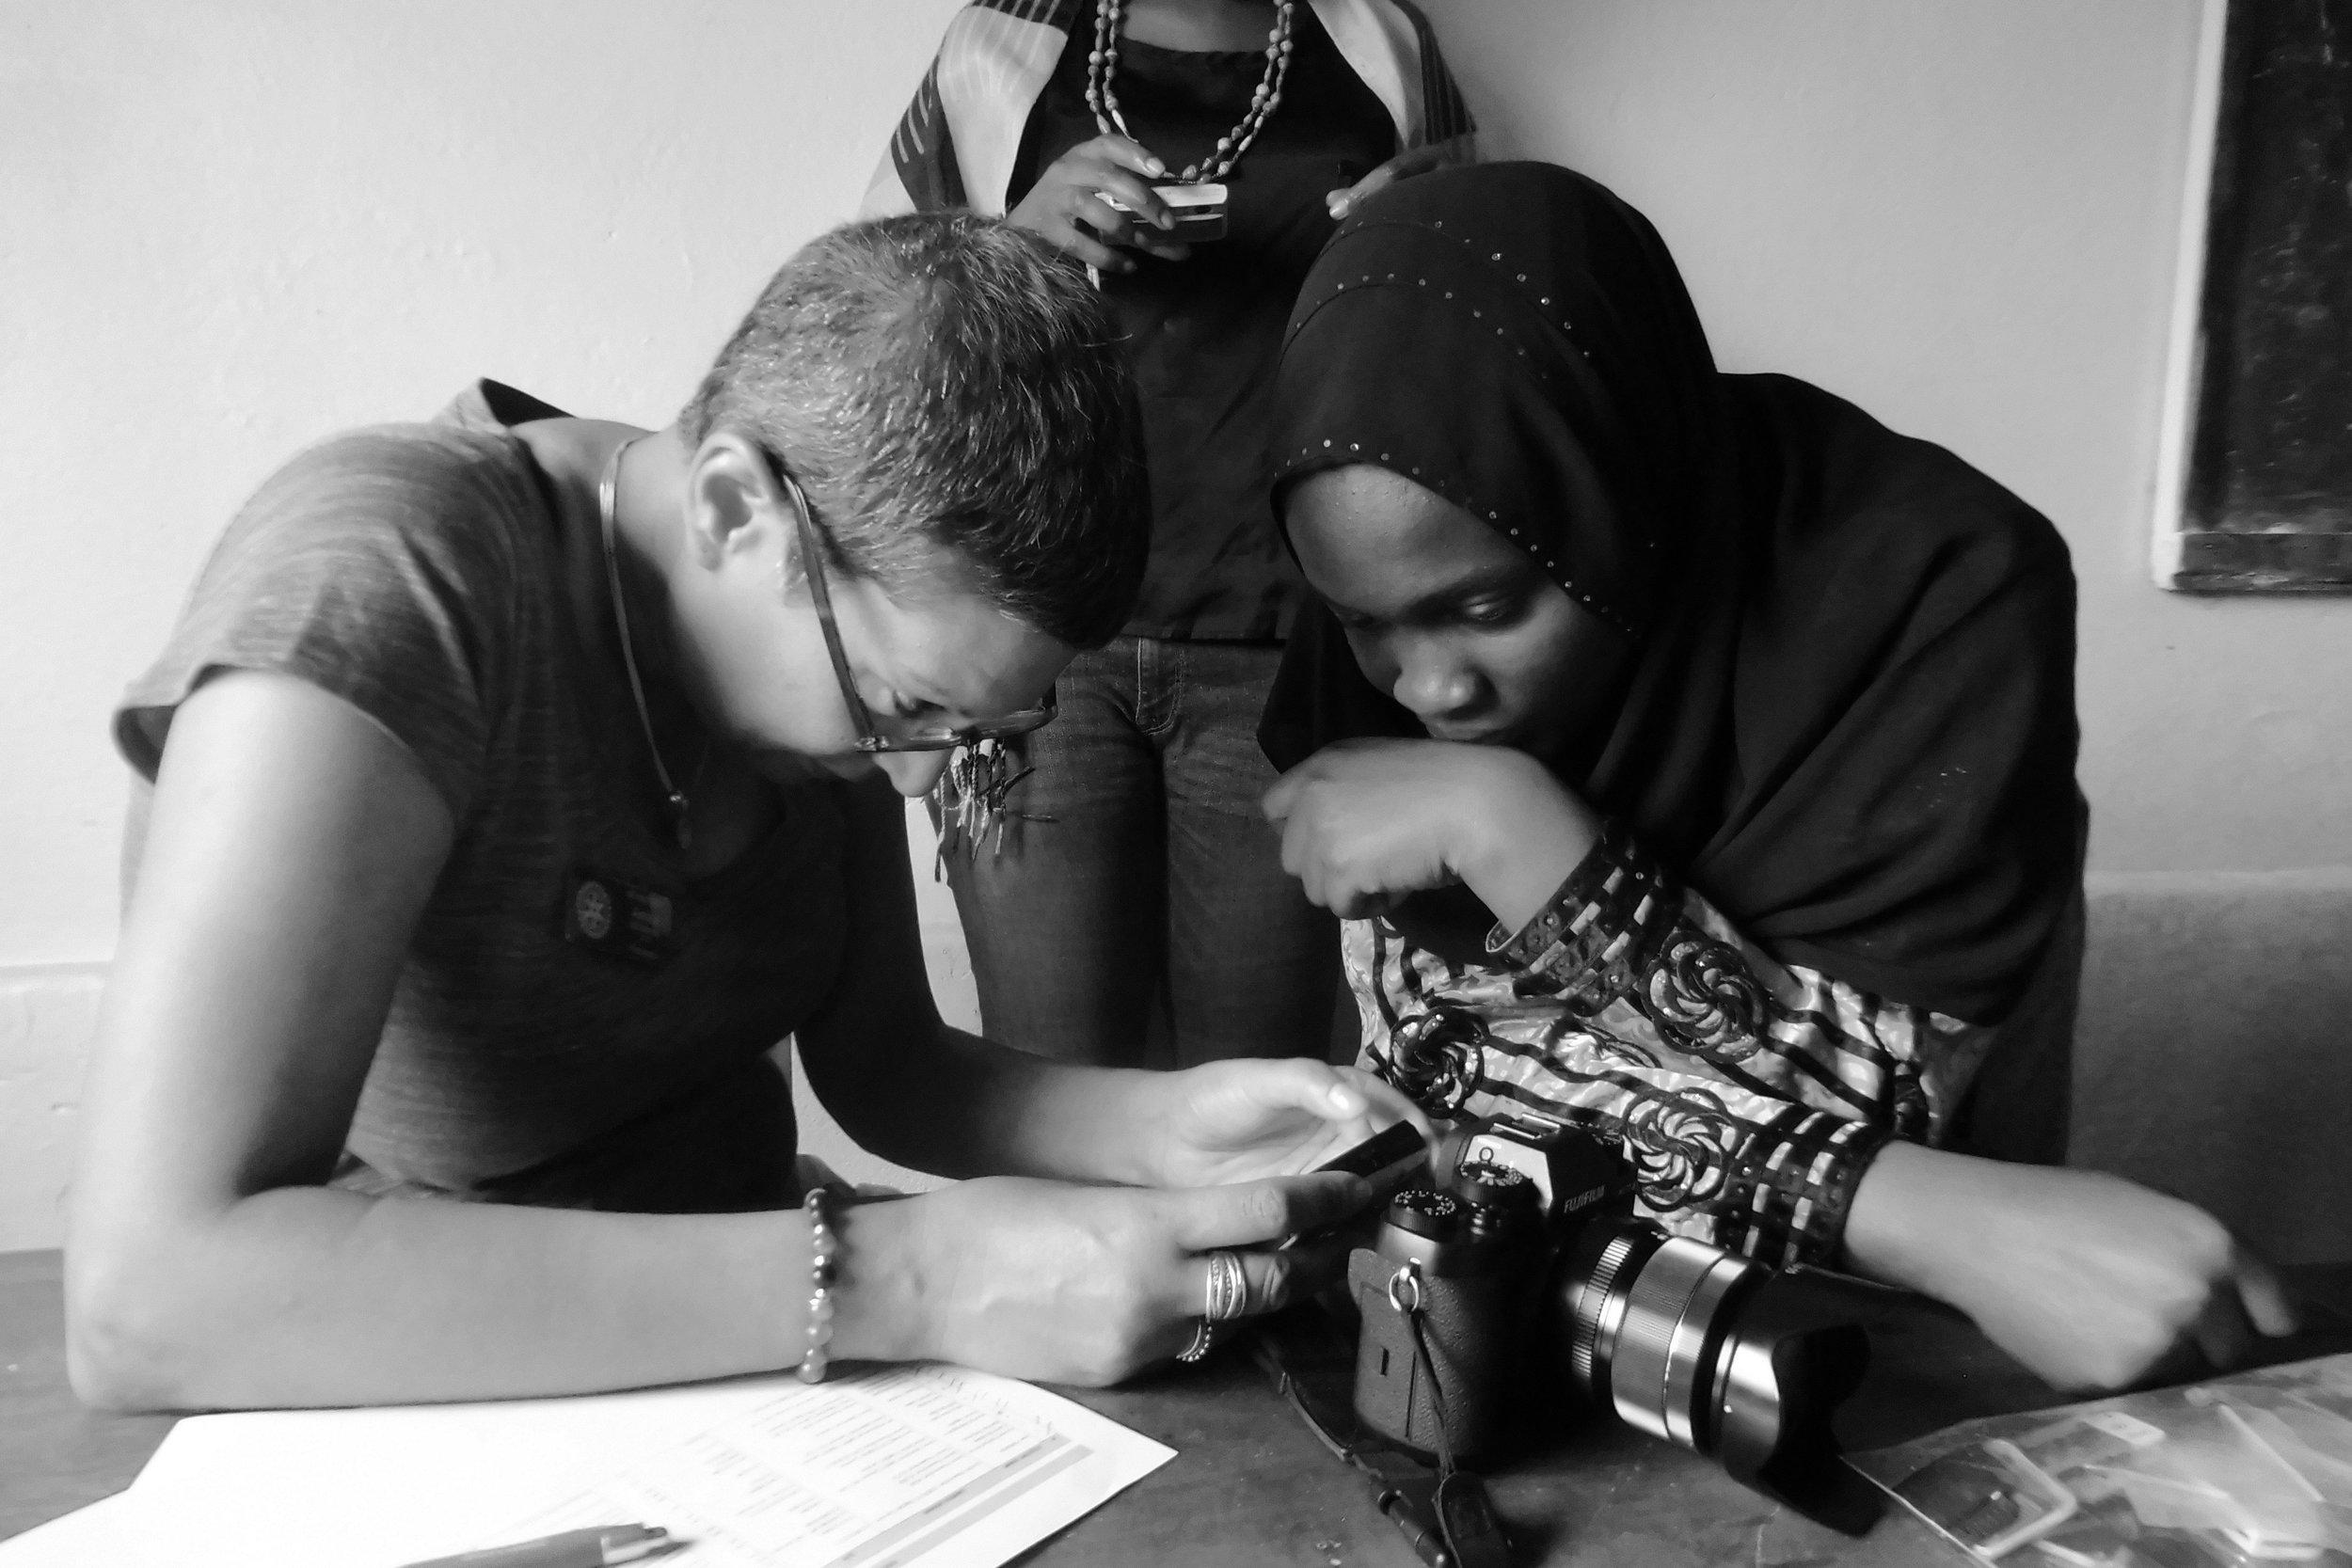 Amina showing Hafitha how to operate her camera, Cameras for Girls Uganda